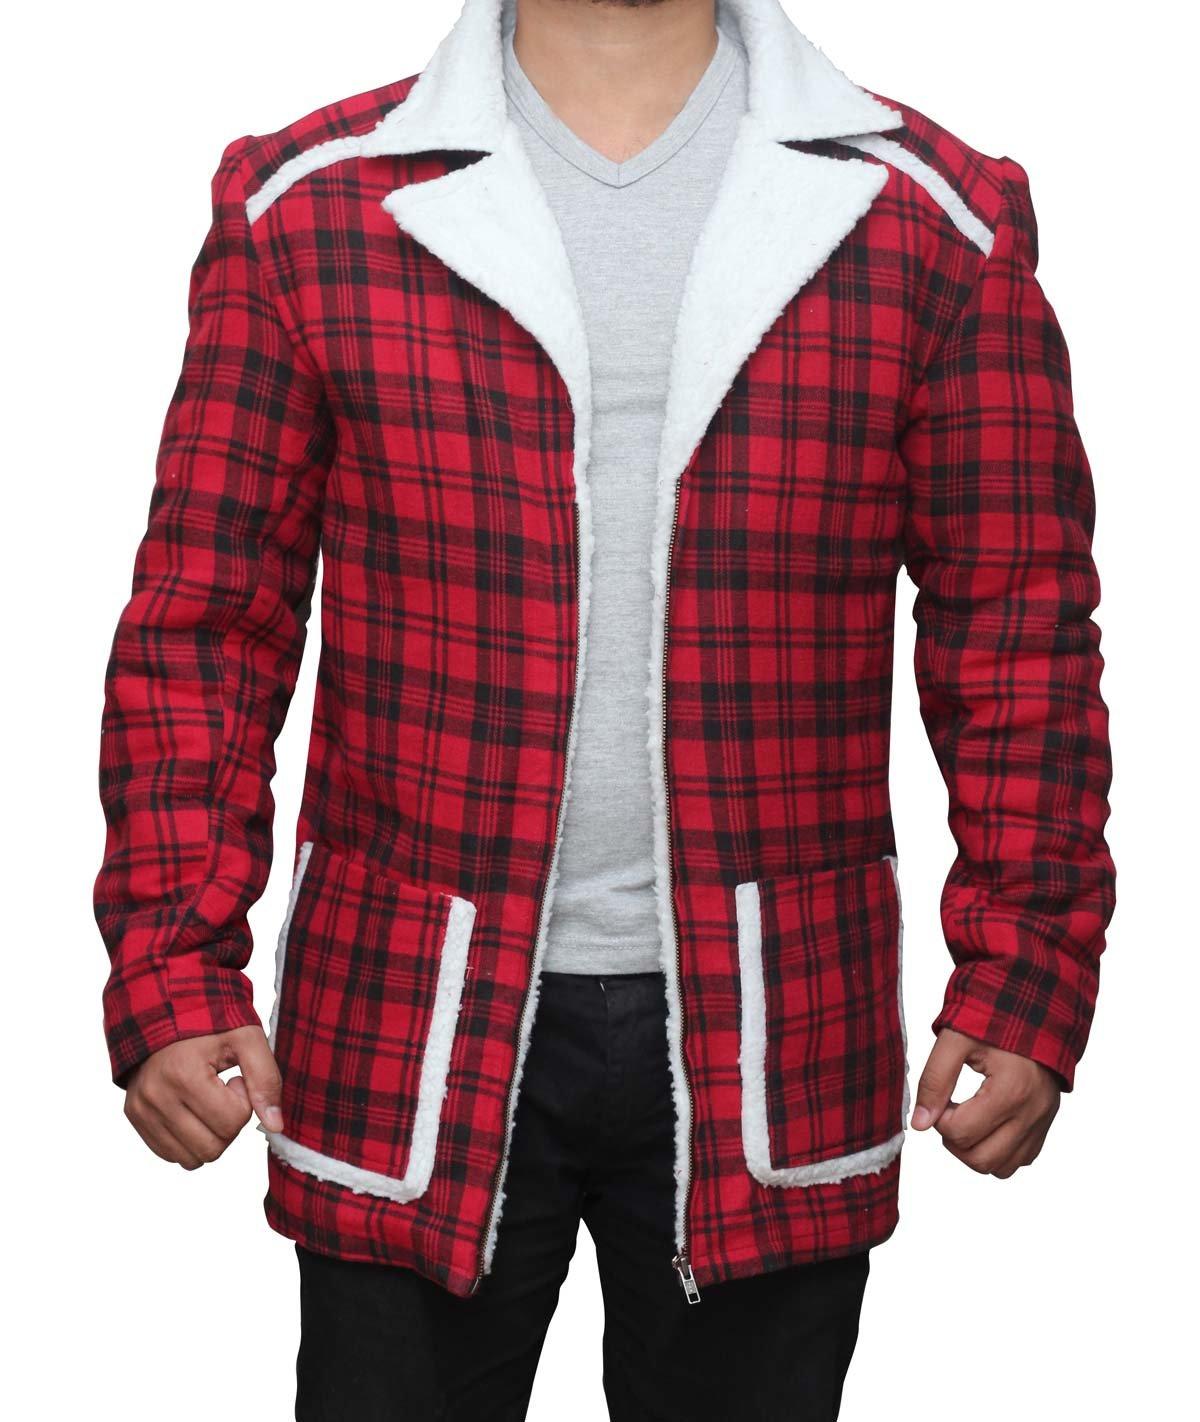 Decrum OUTERWEAR メンズ B01DPGNNB8 XL Deadpool Shearling Deadpool Shearling XL